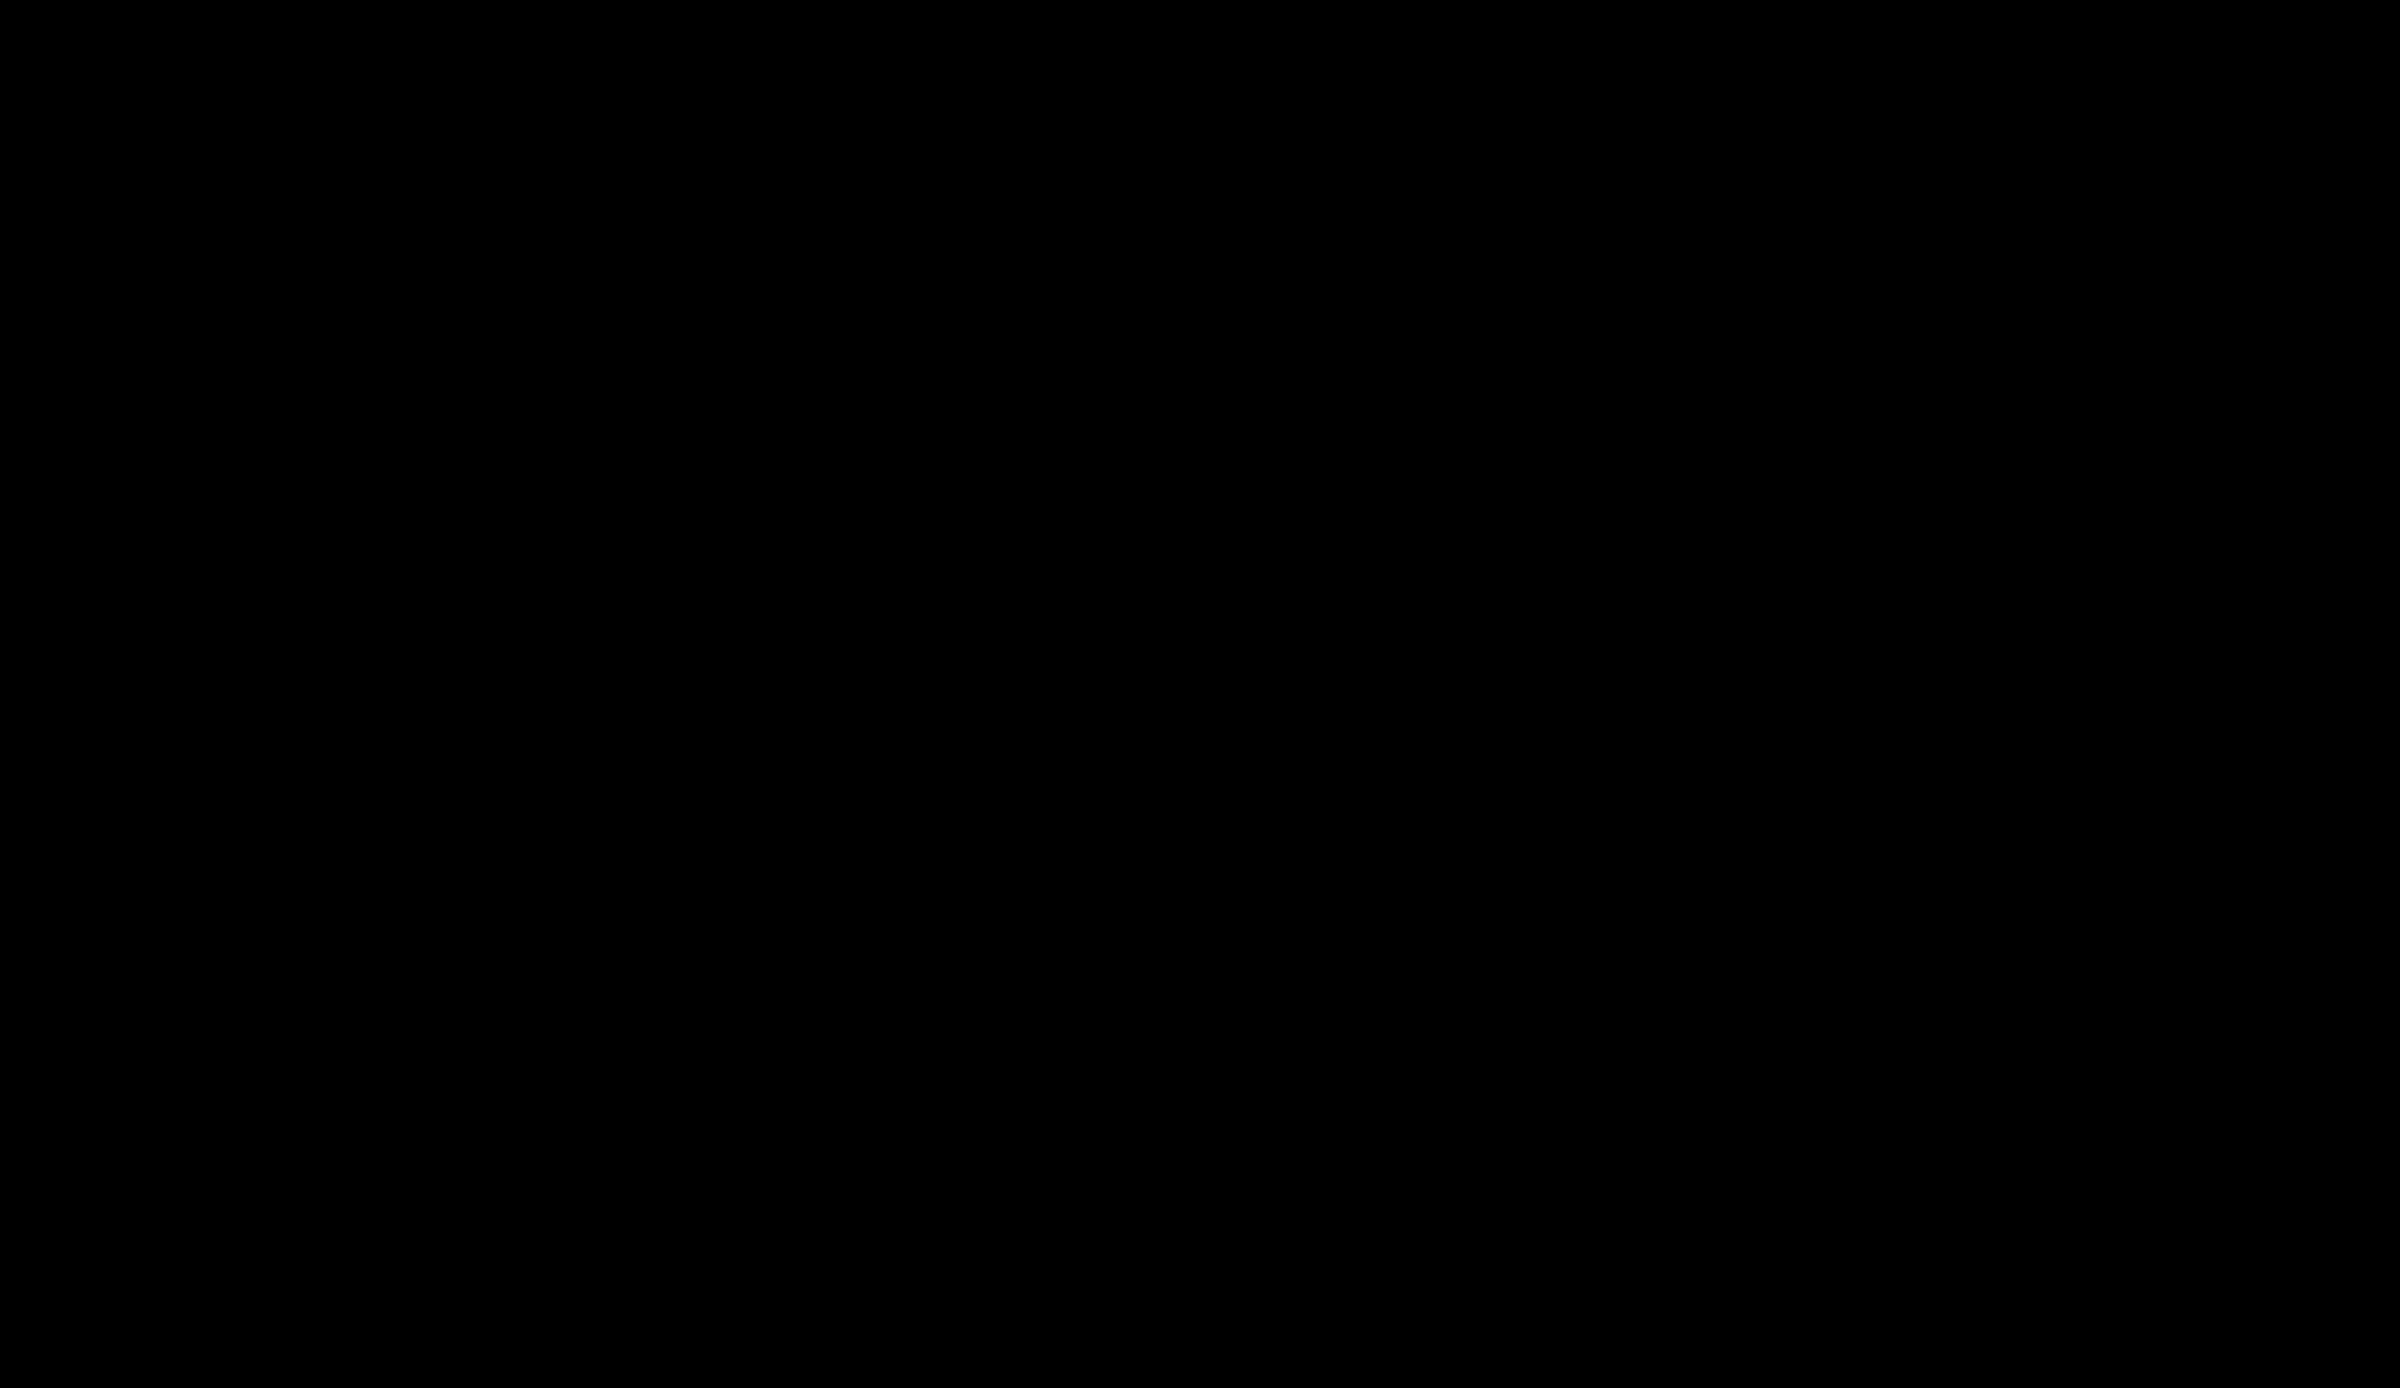 2400x1388 Silhouette